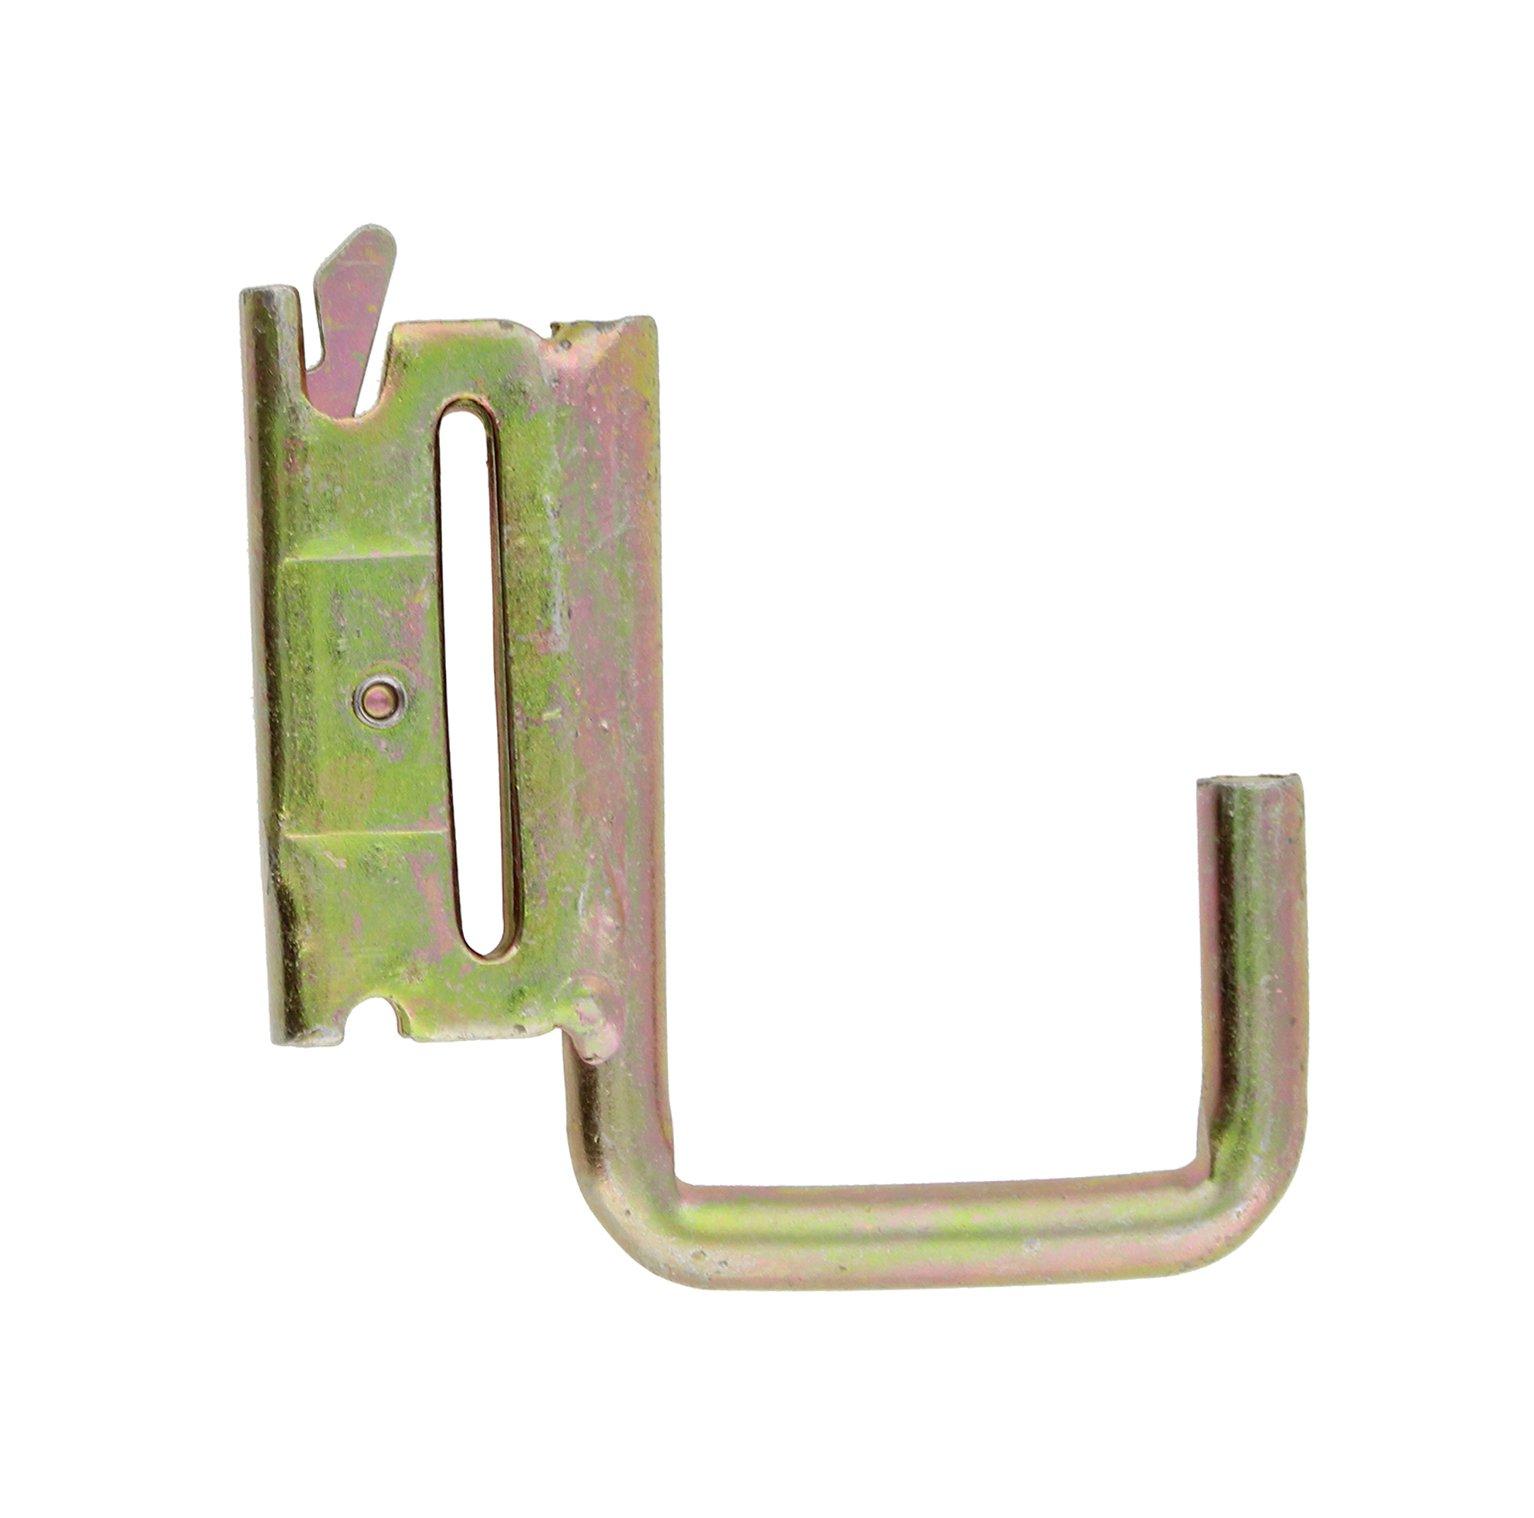 ABN J-Hook Tie Down Anchor for E-Track (2-Pack) – E Track Tiedown Anchors/Fittings, J Hooks for Cargo Storage Shelf